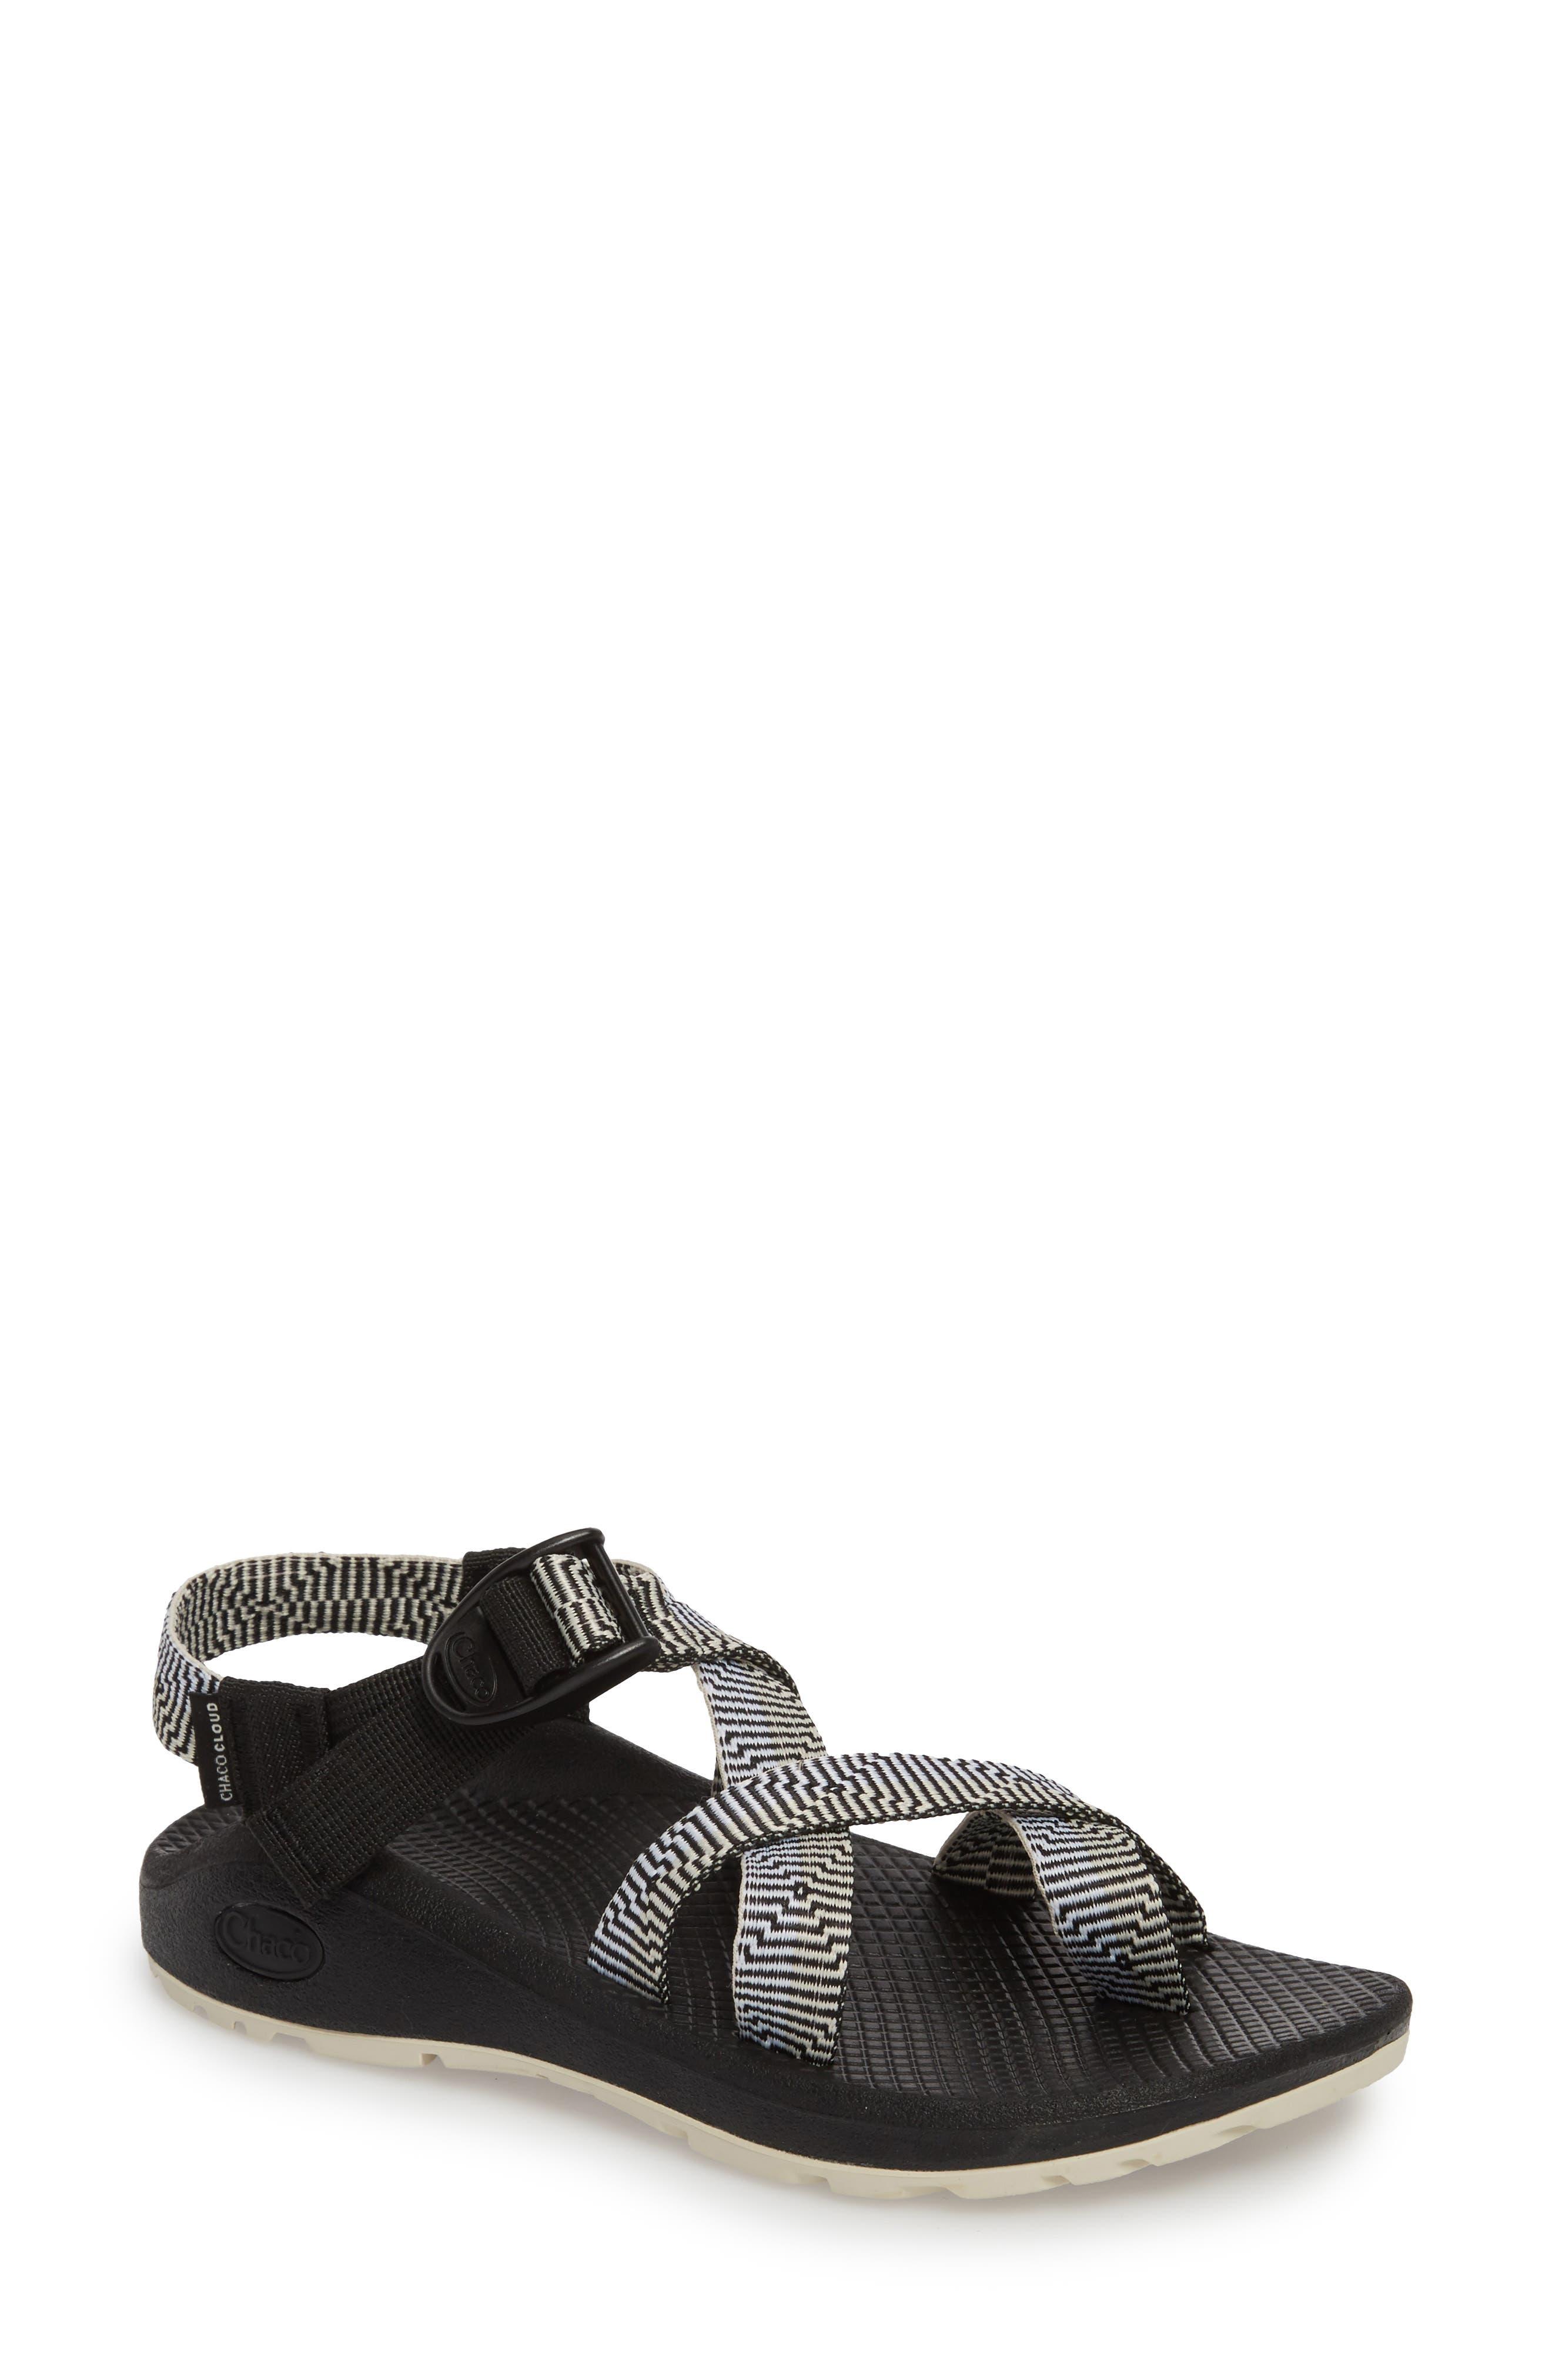 Z/Cloud 2 Sport Sandal,                         Main,                         color, LLAMA ANGORA